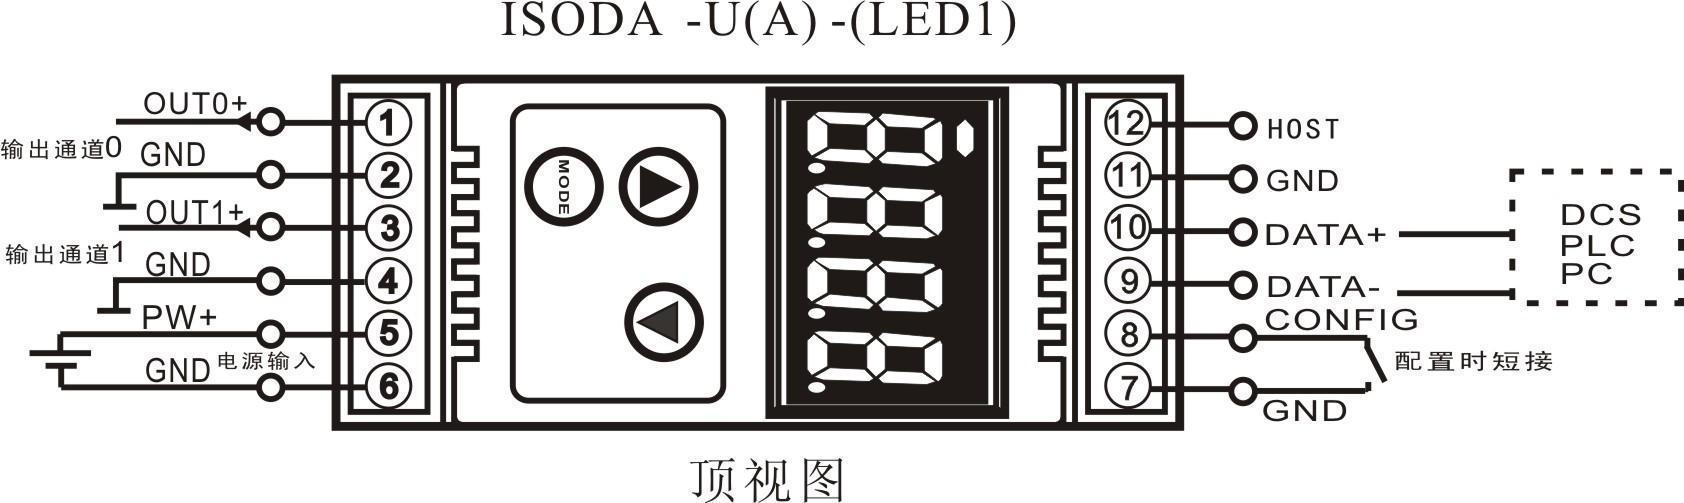 ISO DA(LED1)功能简介 ISO DA(LED1)信号隔离D/A转换模块,可以用来输出一路电压或电流信号,也可以用来输出两路可以共地的电流或电压信号,并可实时显示输出模拟量信号值。 模拟信号输出 12位输出精度,产品出厂前所有信号输出范围已全部校准。在使用时,用户也可以很方便的自行编程校准。 具体电流或电压输出量程请看产品选型,输出两路信号时两路输出选型必须相同。 通讯协议 通讯接口: 1路标准的RS485通讯接口或1路标准的RS232通讯接口,订货选型时注明通讯方式。 通讯协议:支持两种协议,命